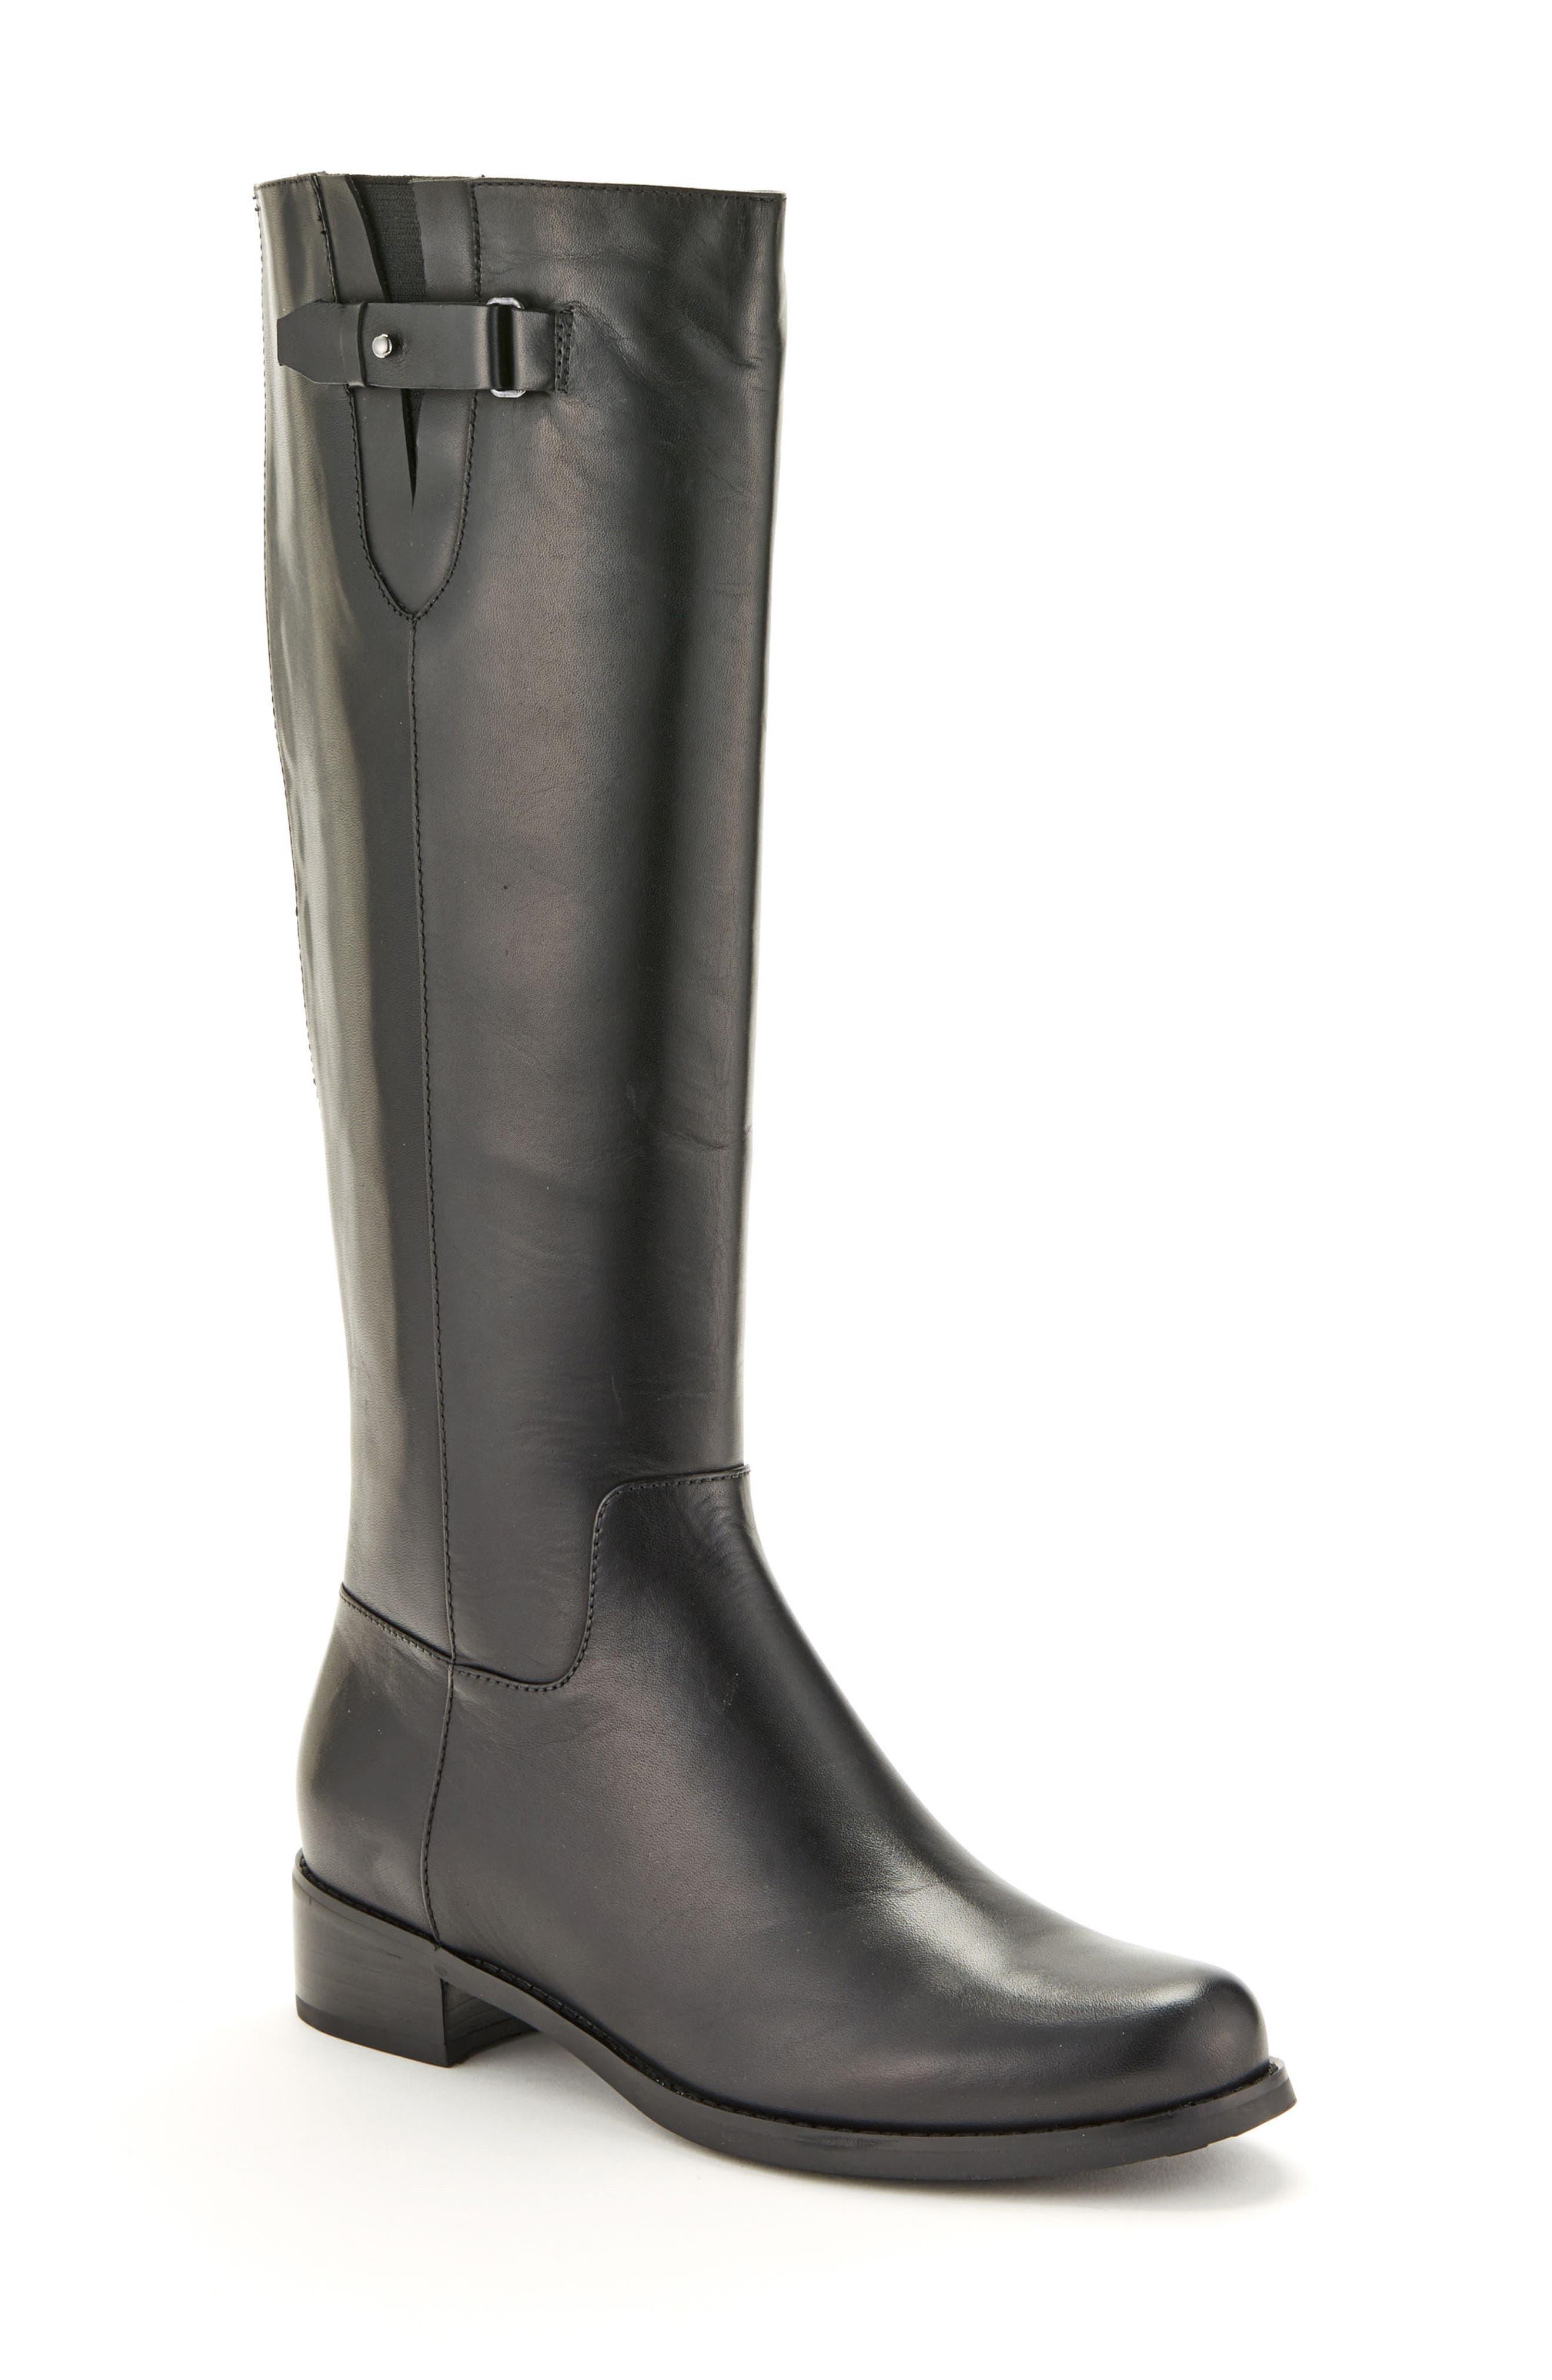 Ugg Boots Johannesburg